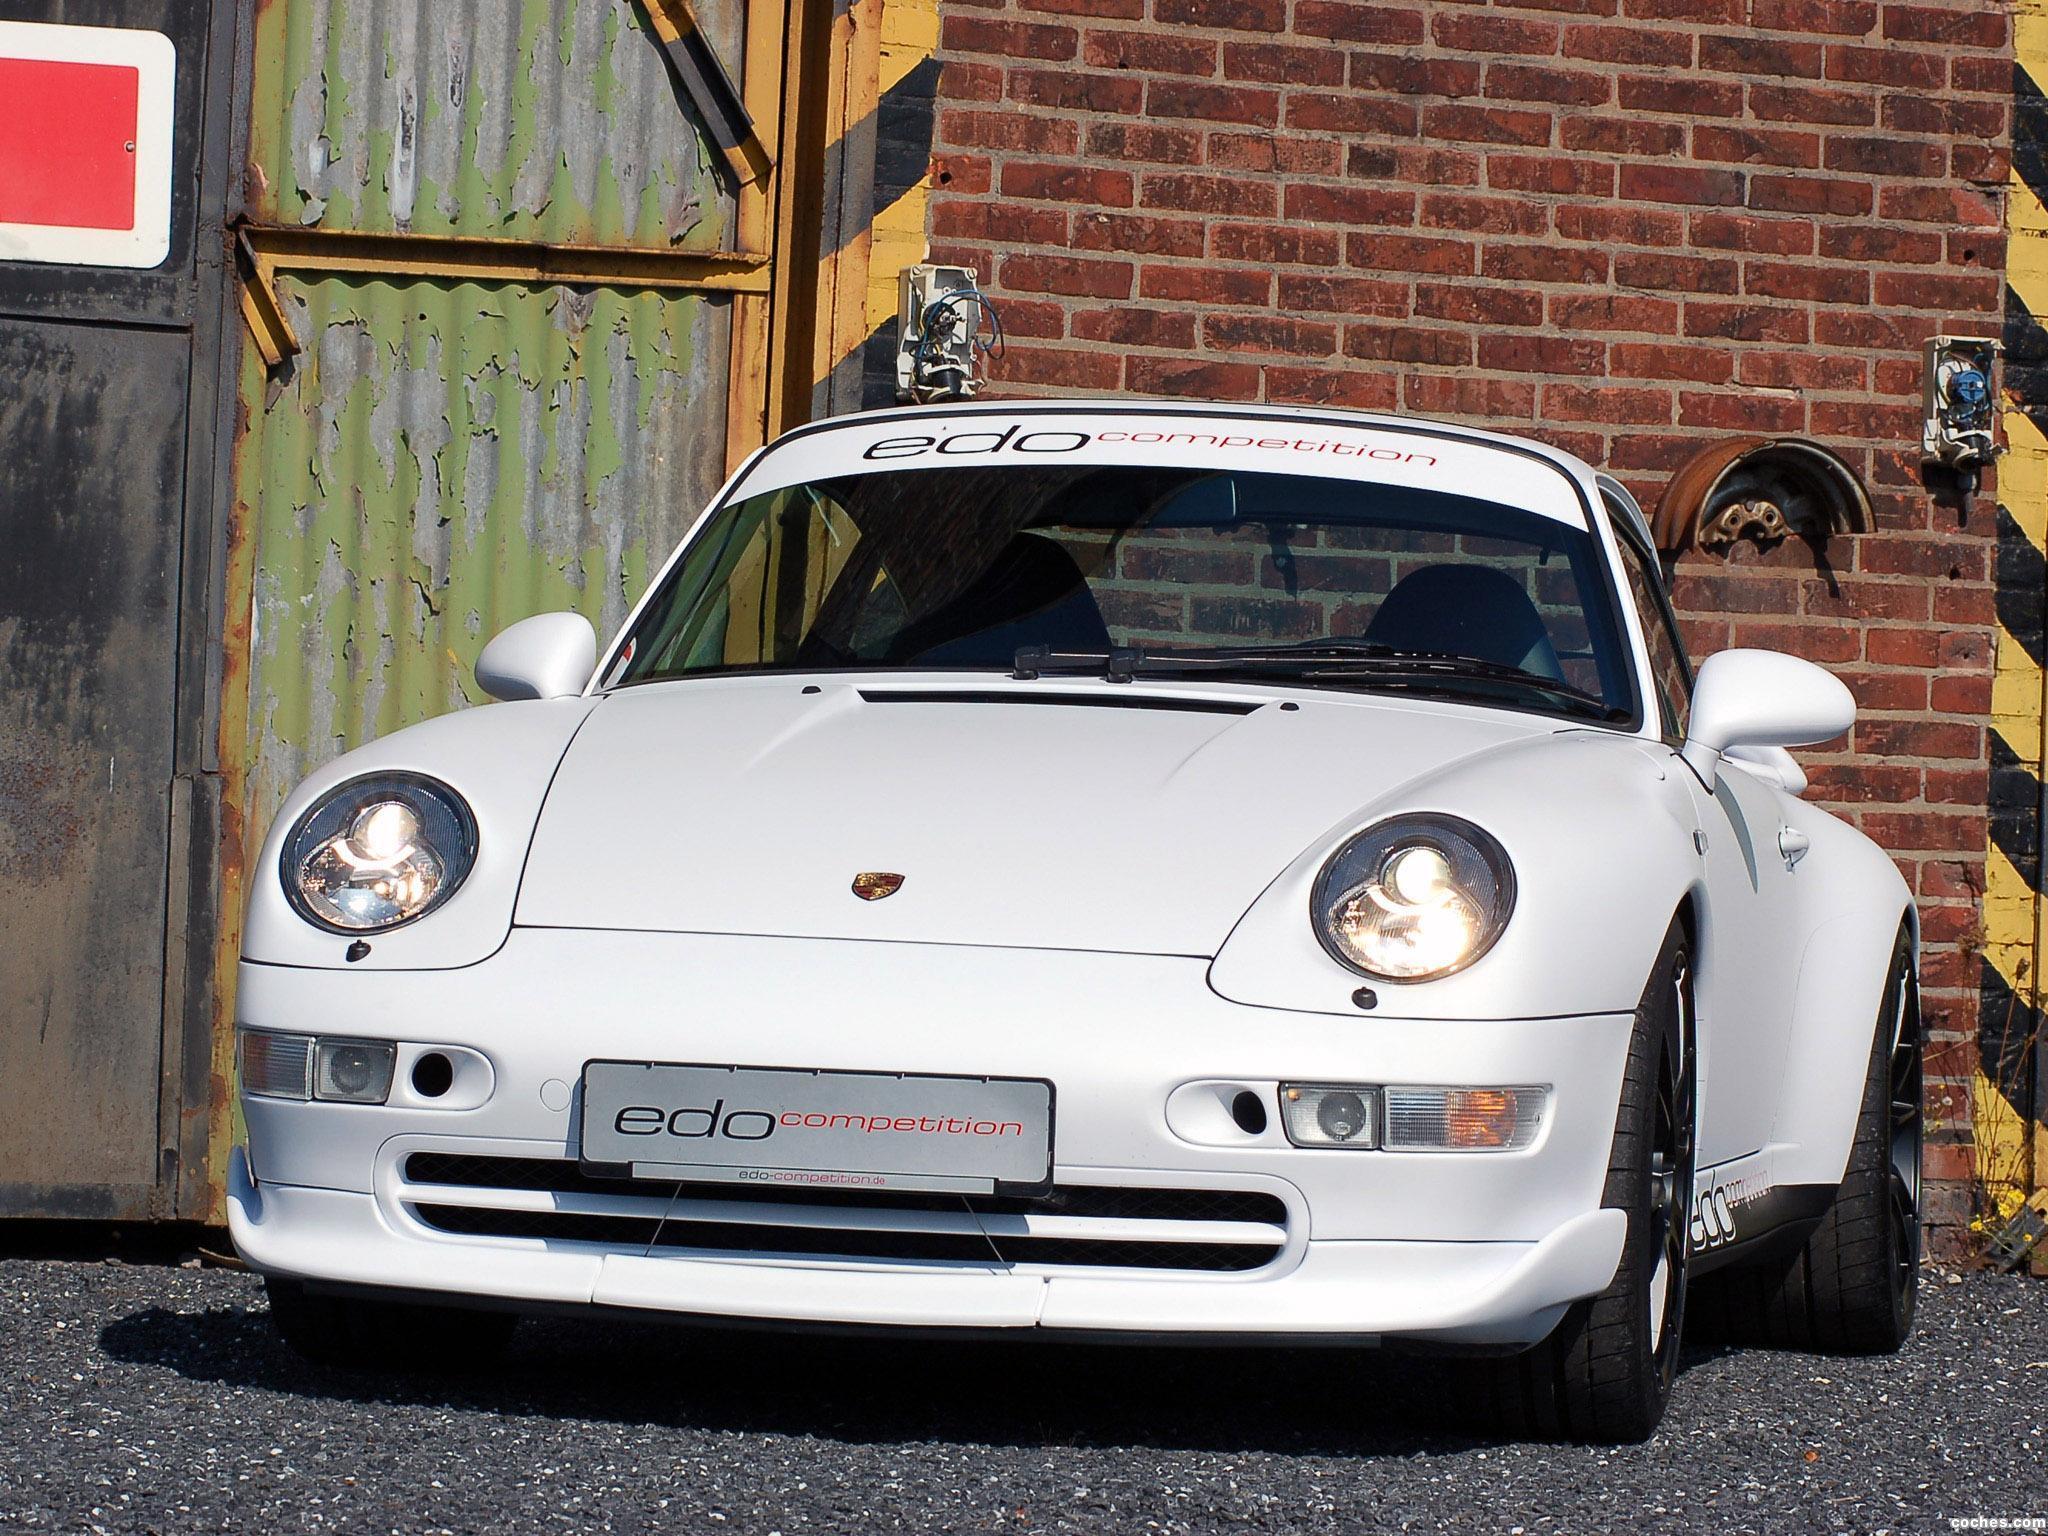 Foto 0 de Porsche Edo 911 Turbo 2012